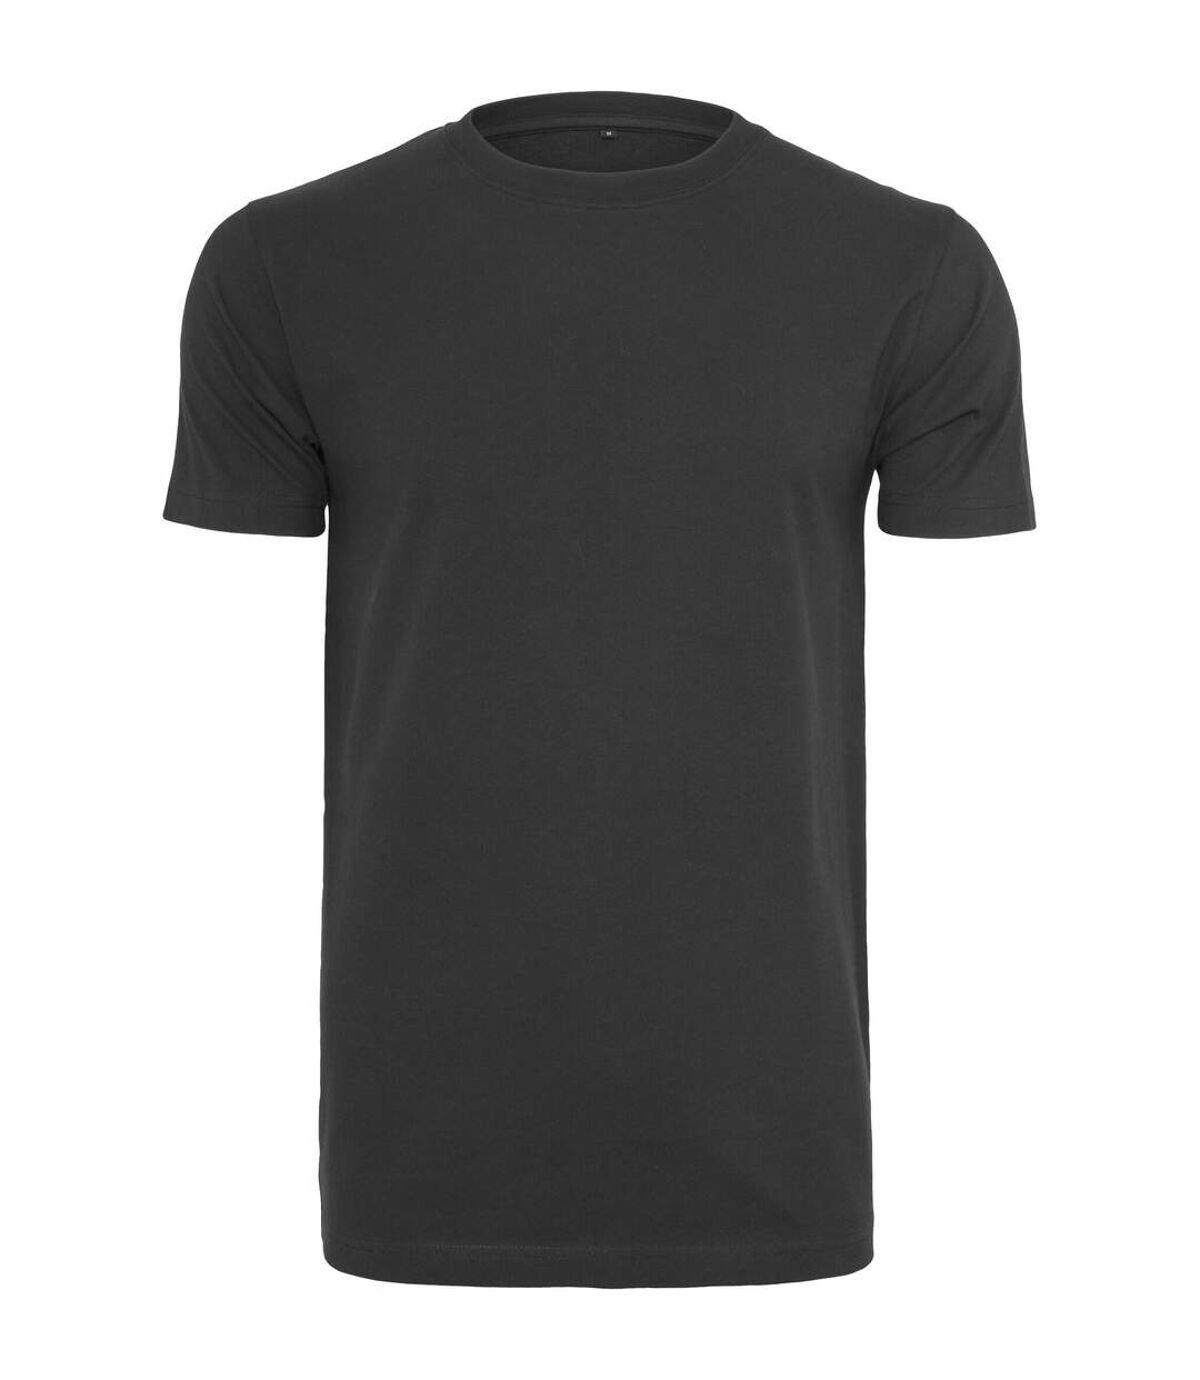 Build Your Brand Mens T-Shirt Round Neck (Black) - UTRW5815